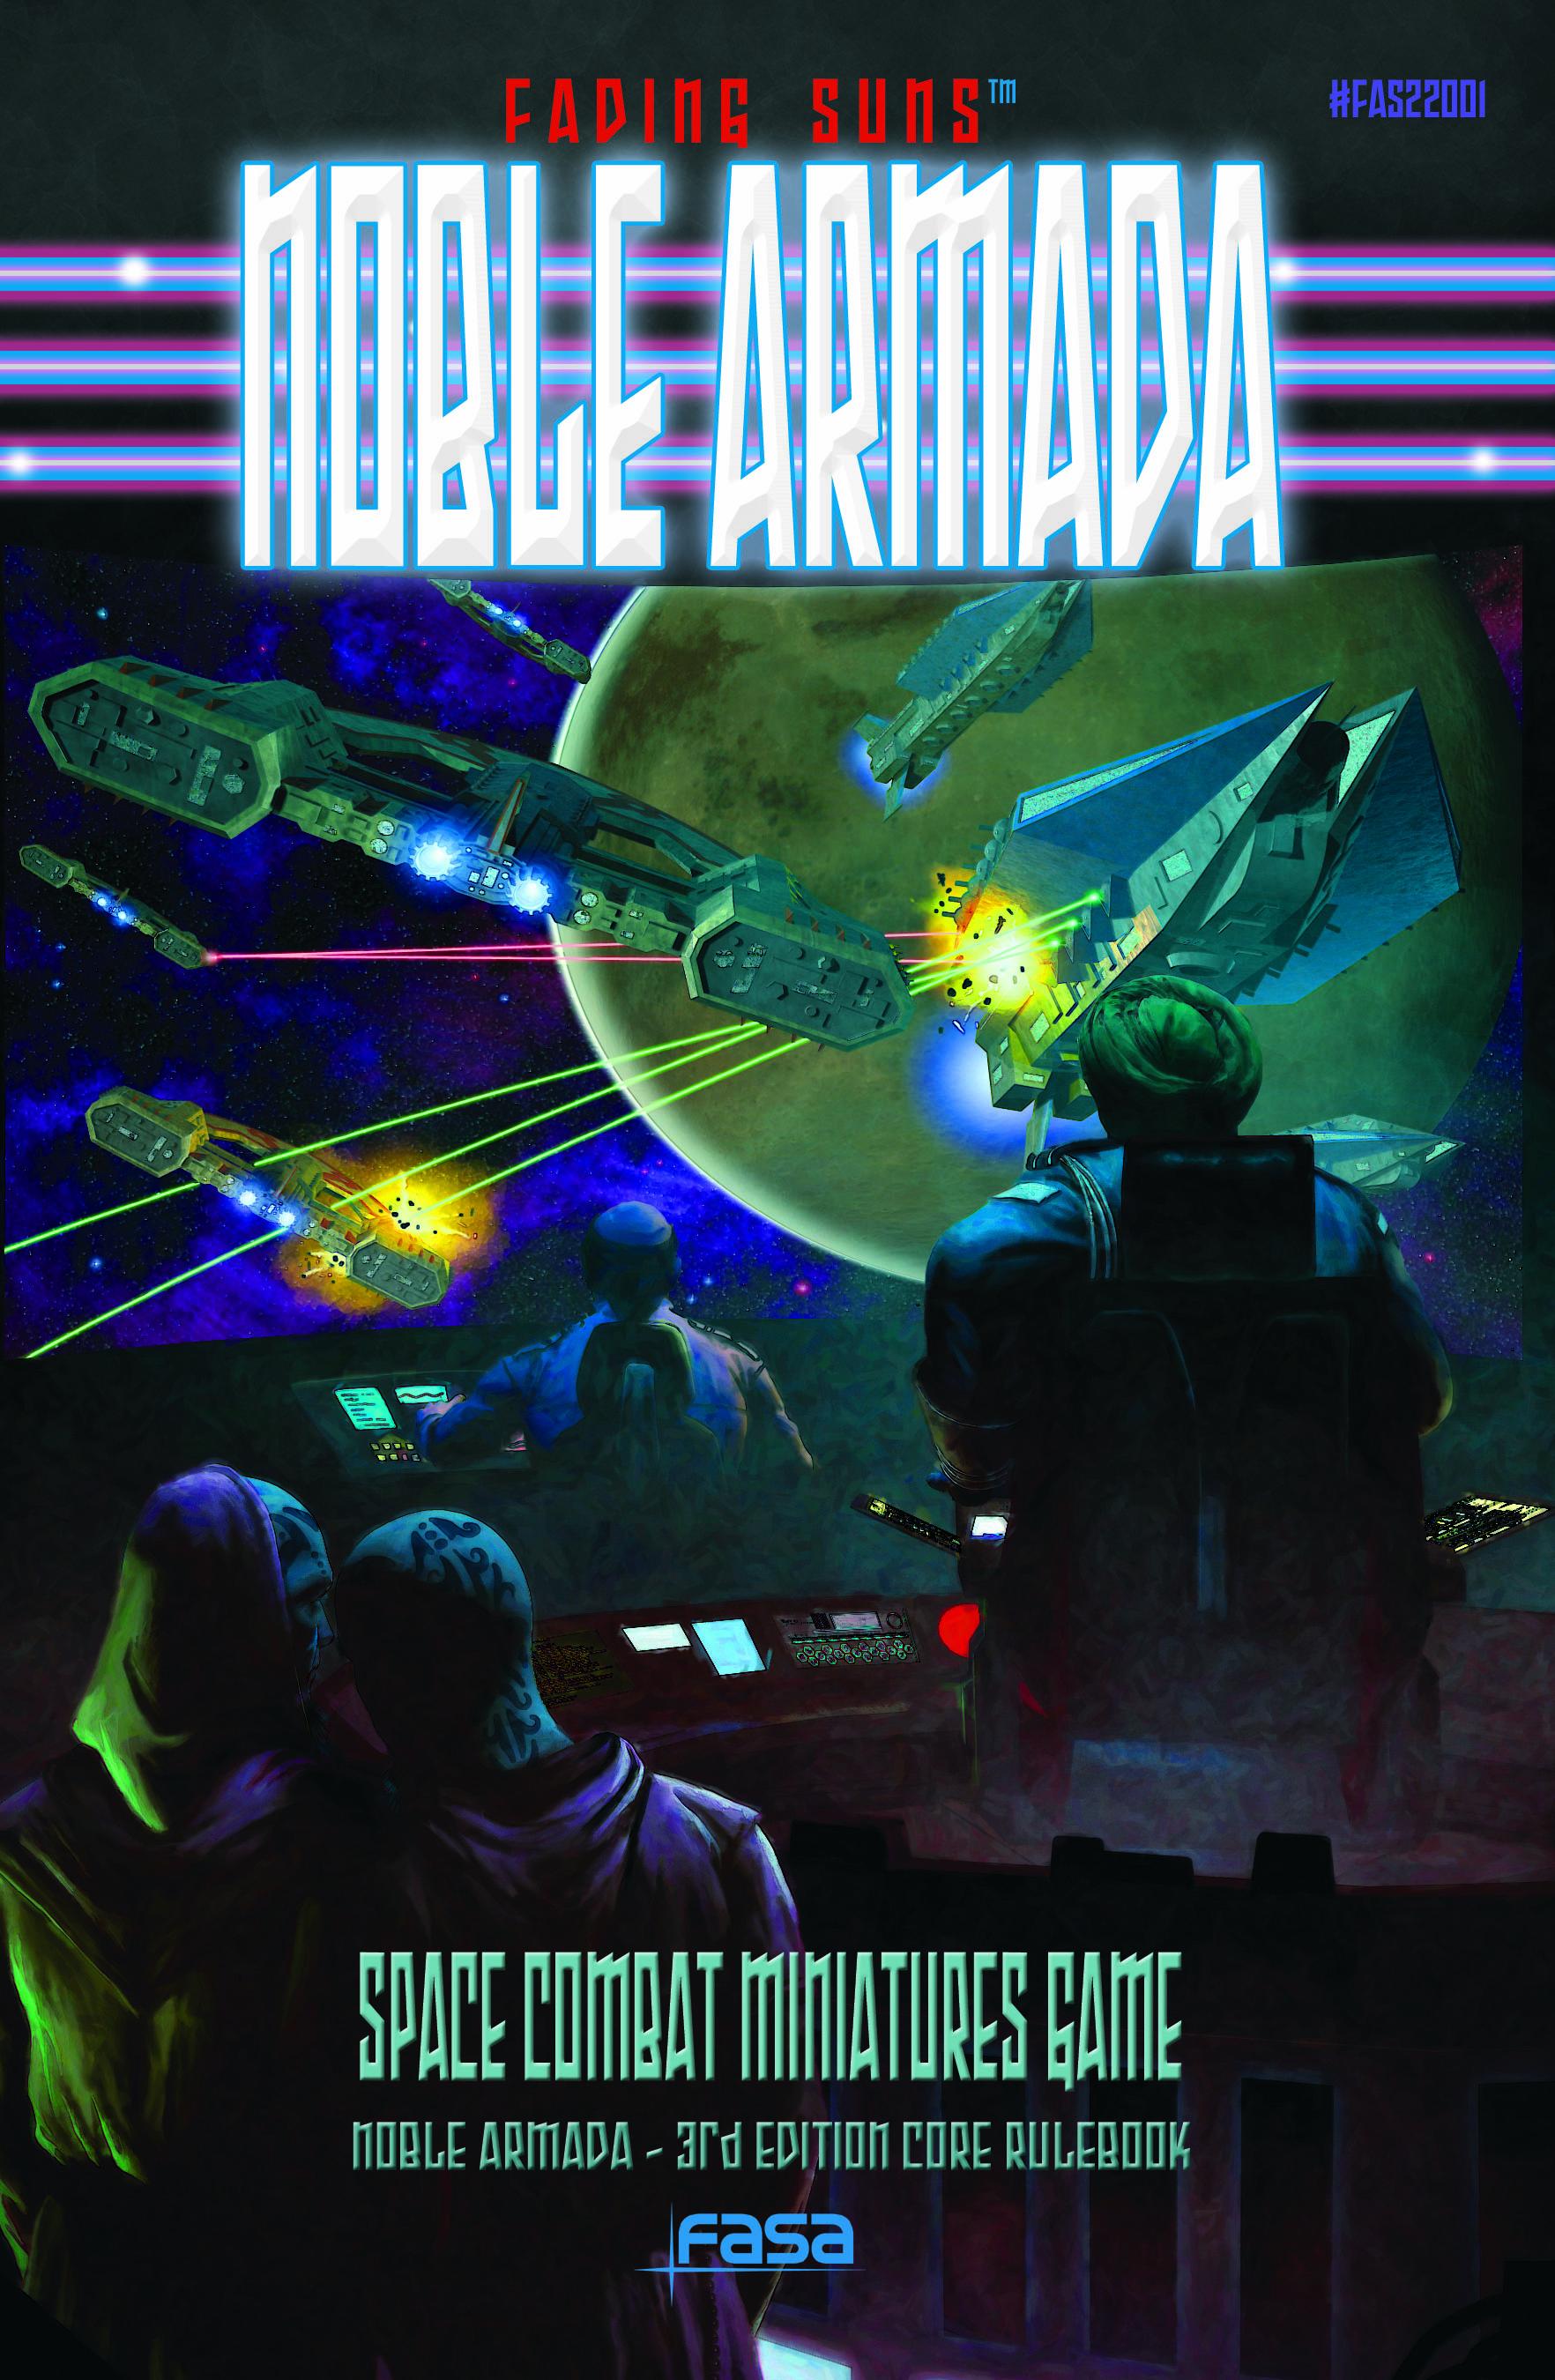 Noble Armada Pre-Order w/ Early beta PDF Access